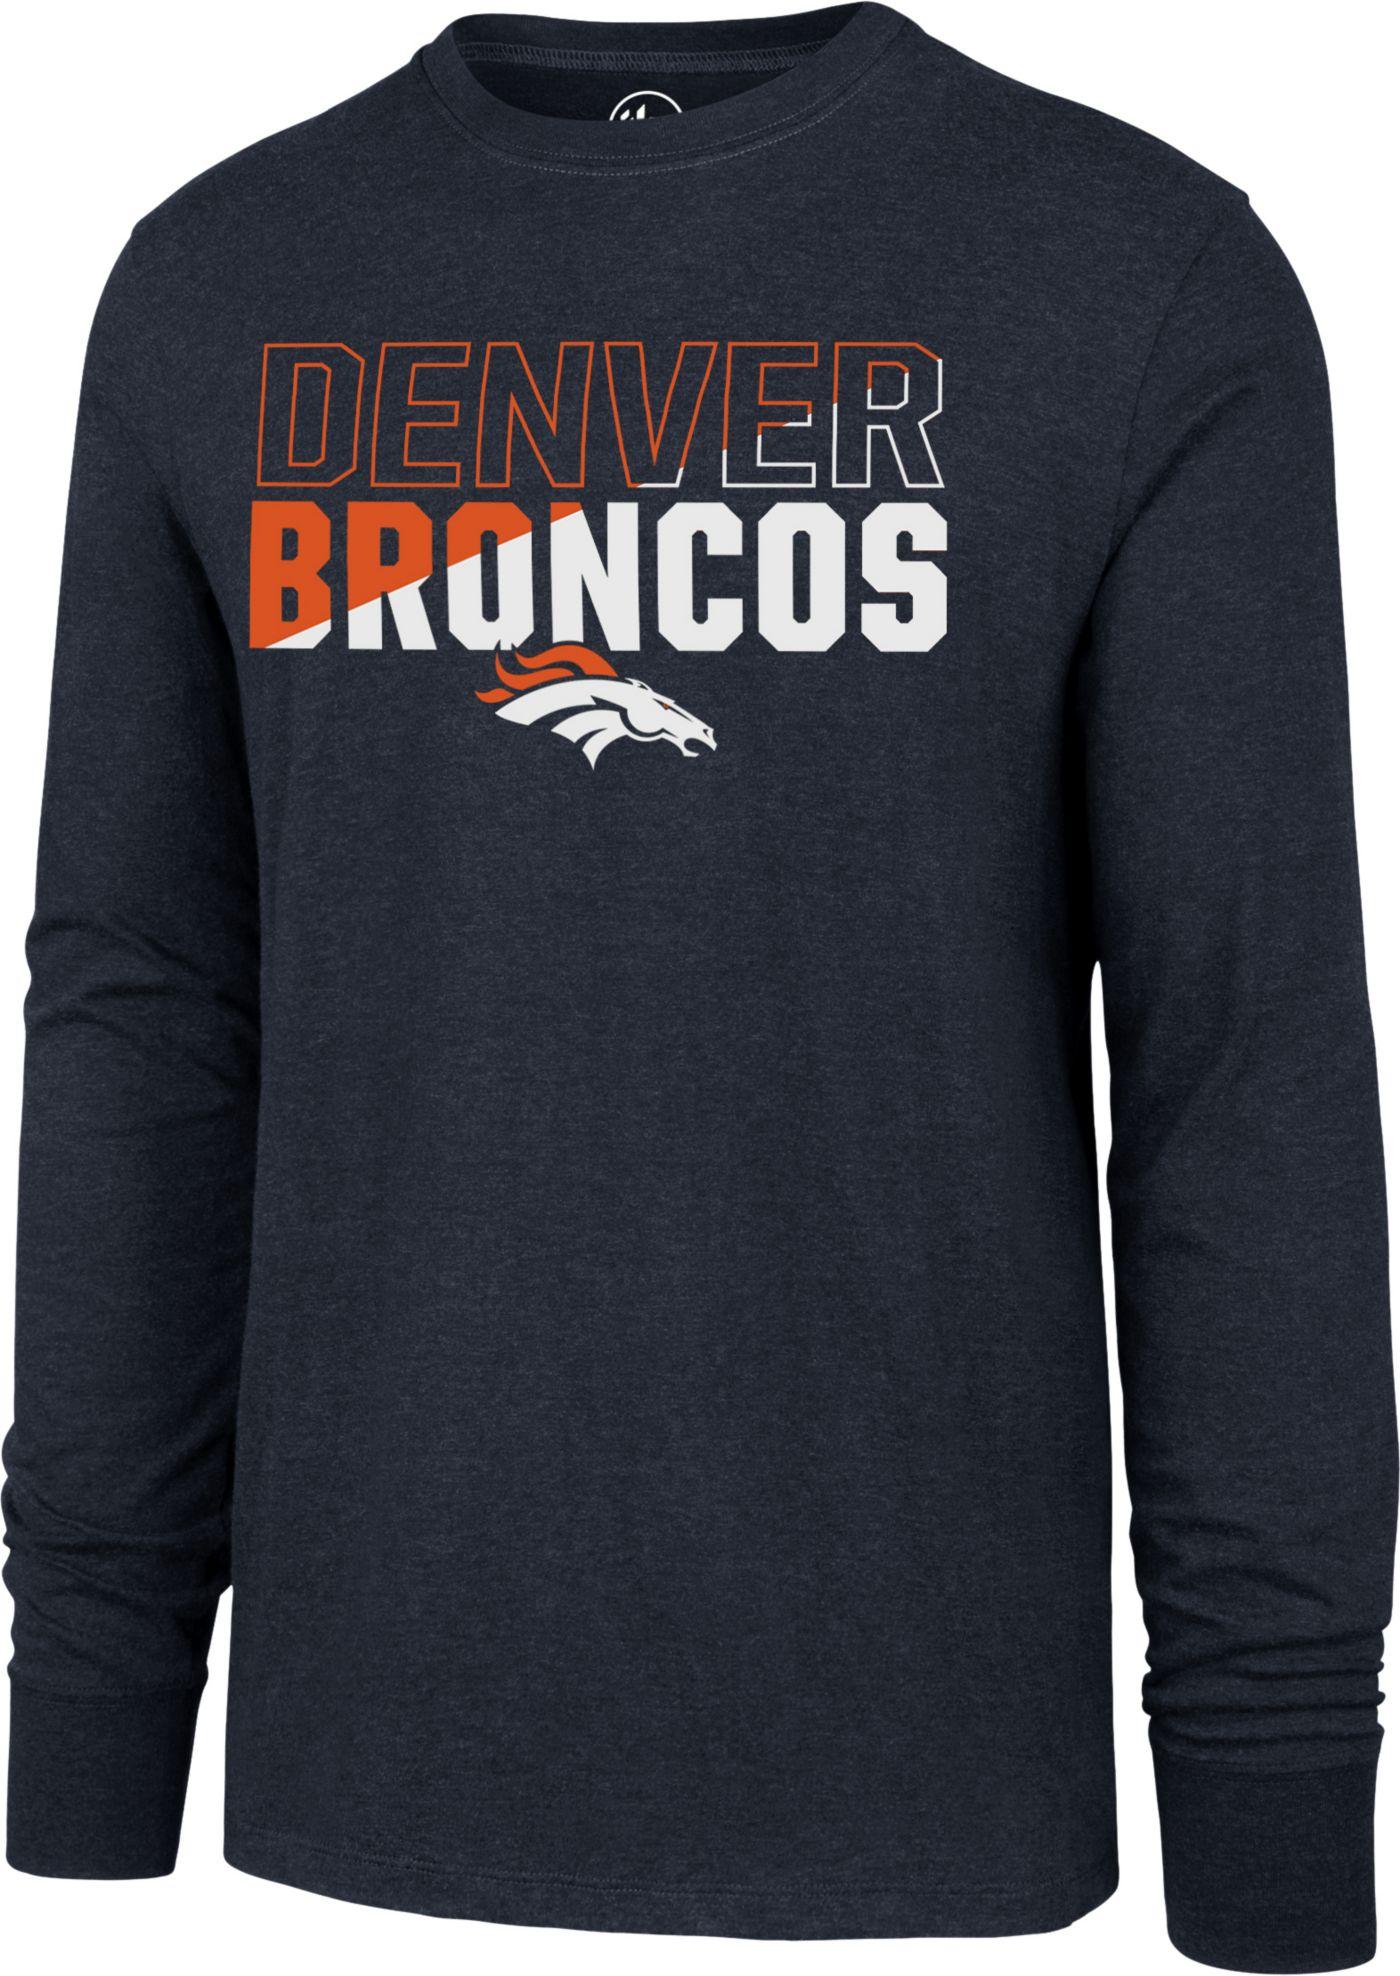 '47 Men's Denver Broncos Club Long Sleeve Navy Shirt